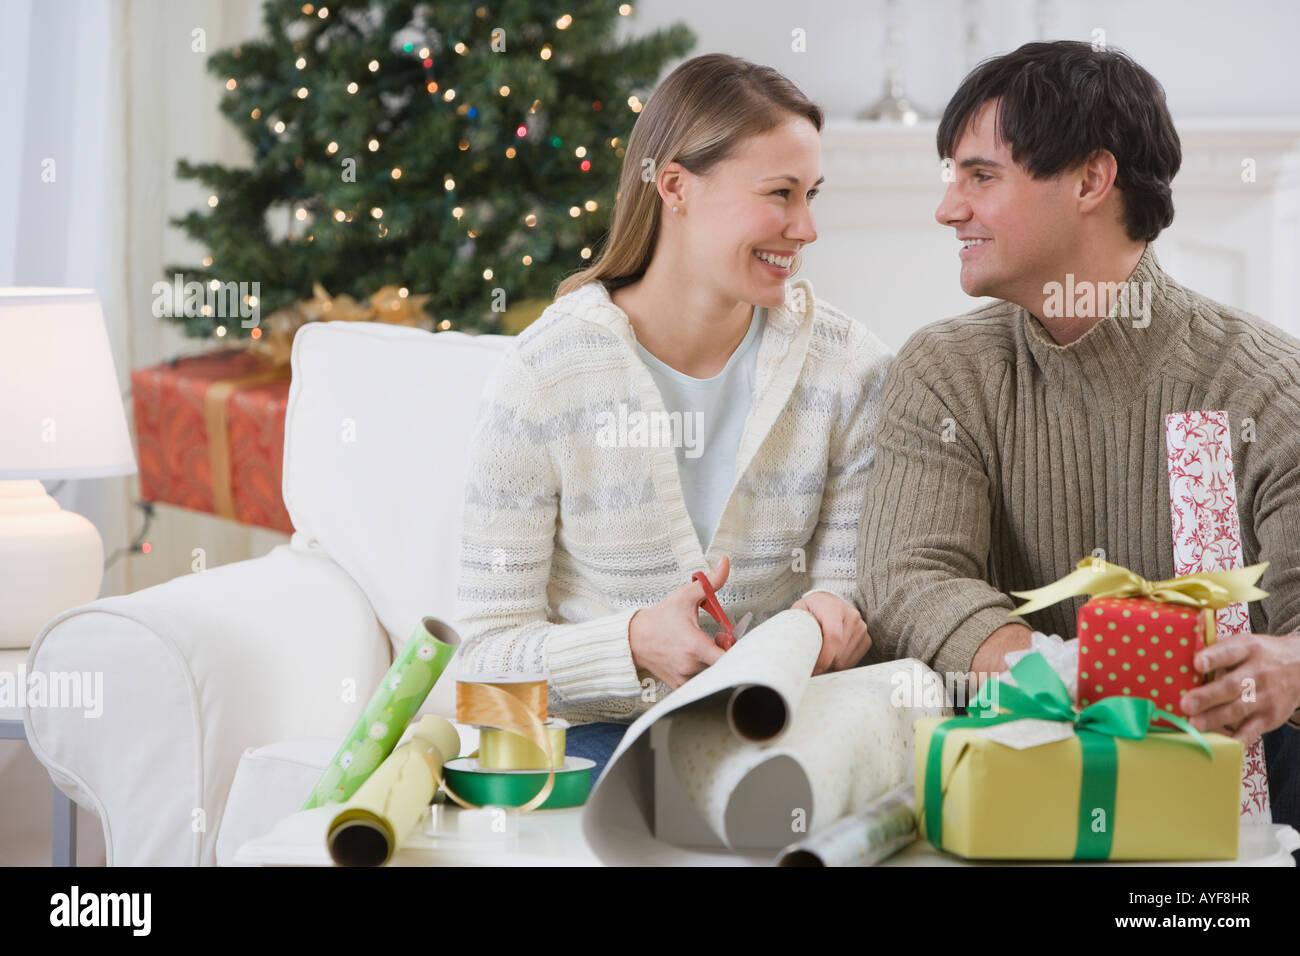 Paar Weihnachtsgeschenke verpacken Stockfoto, Bild: 17090962 - Alamy